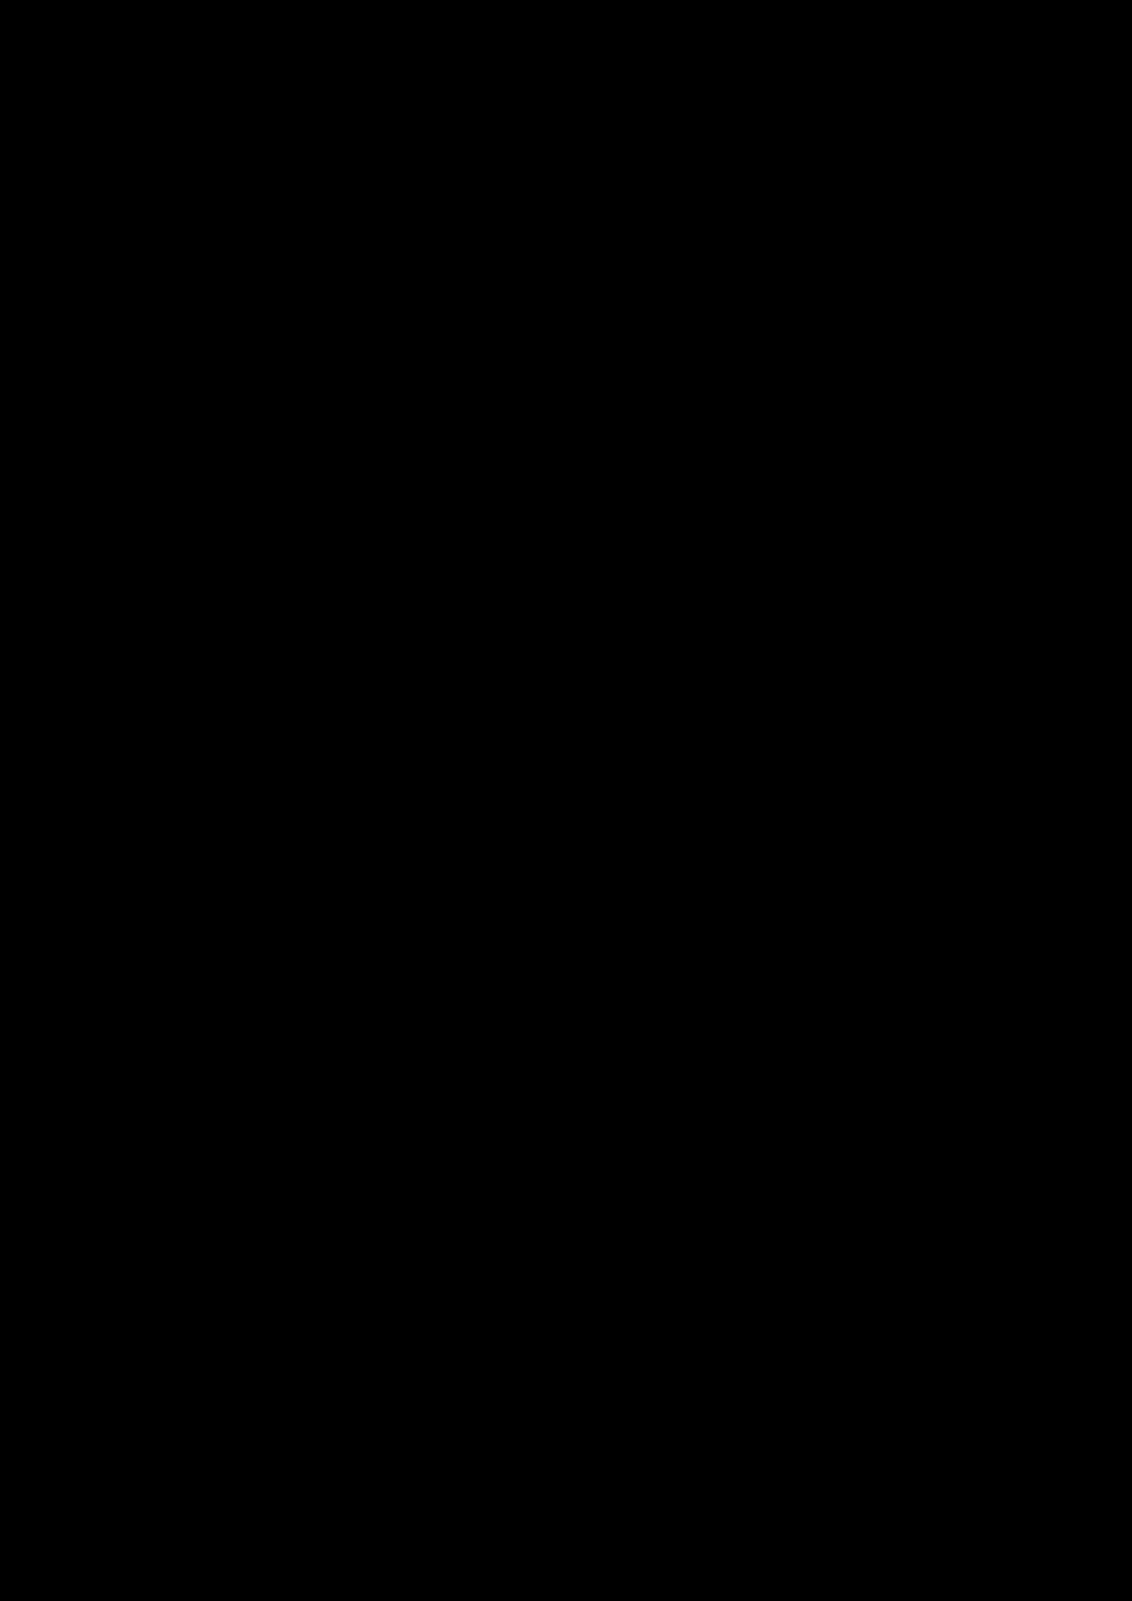 18 berez slide, Image 7